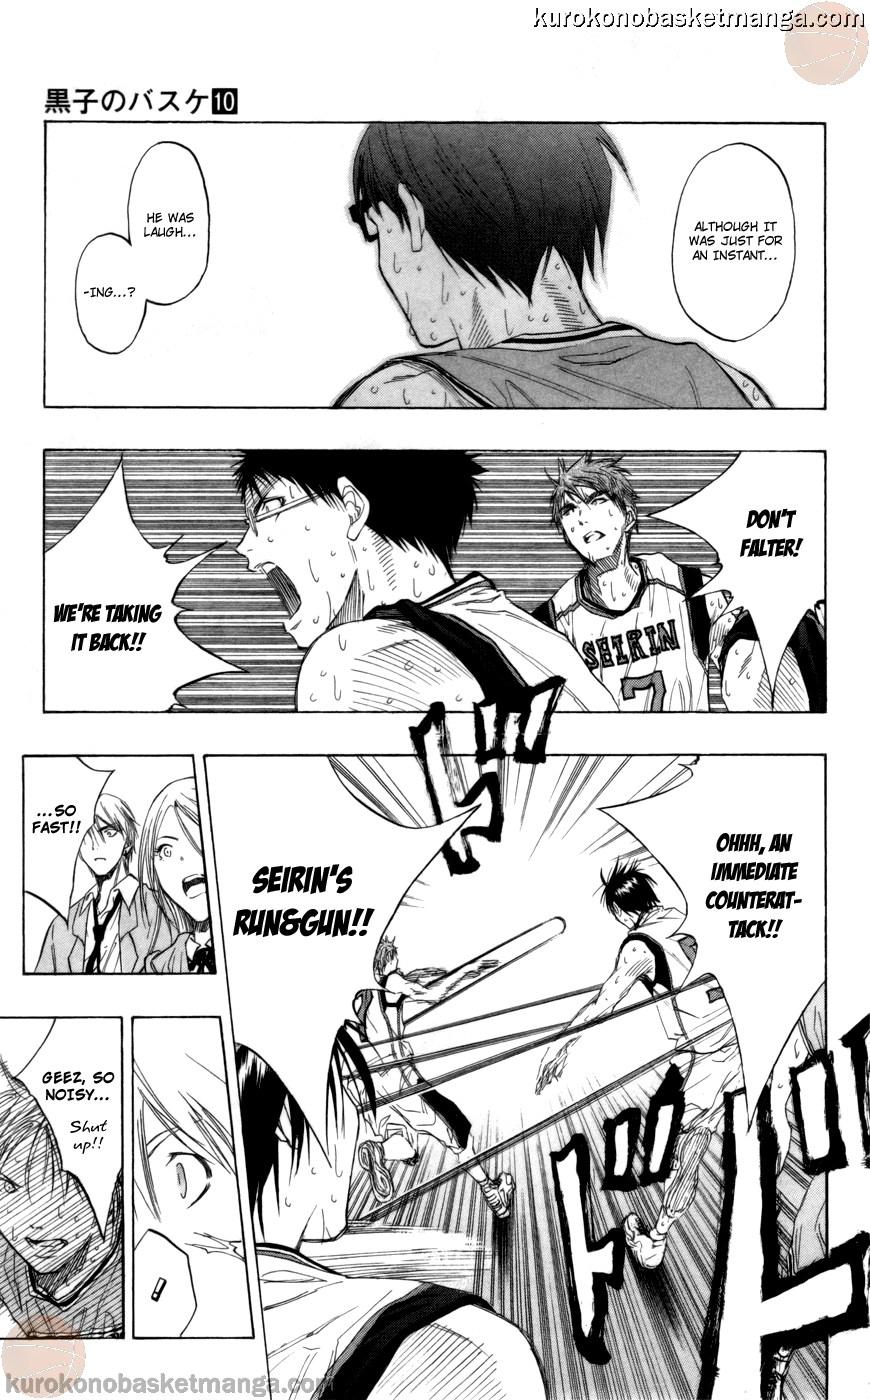 Kuroko no Basket Manga Chapter 89 - Image 09